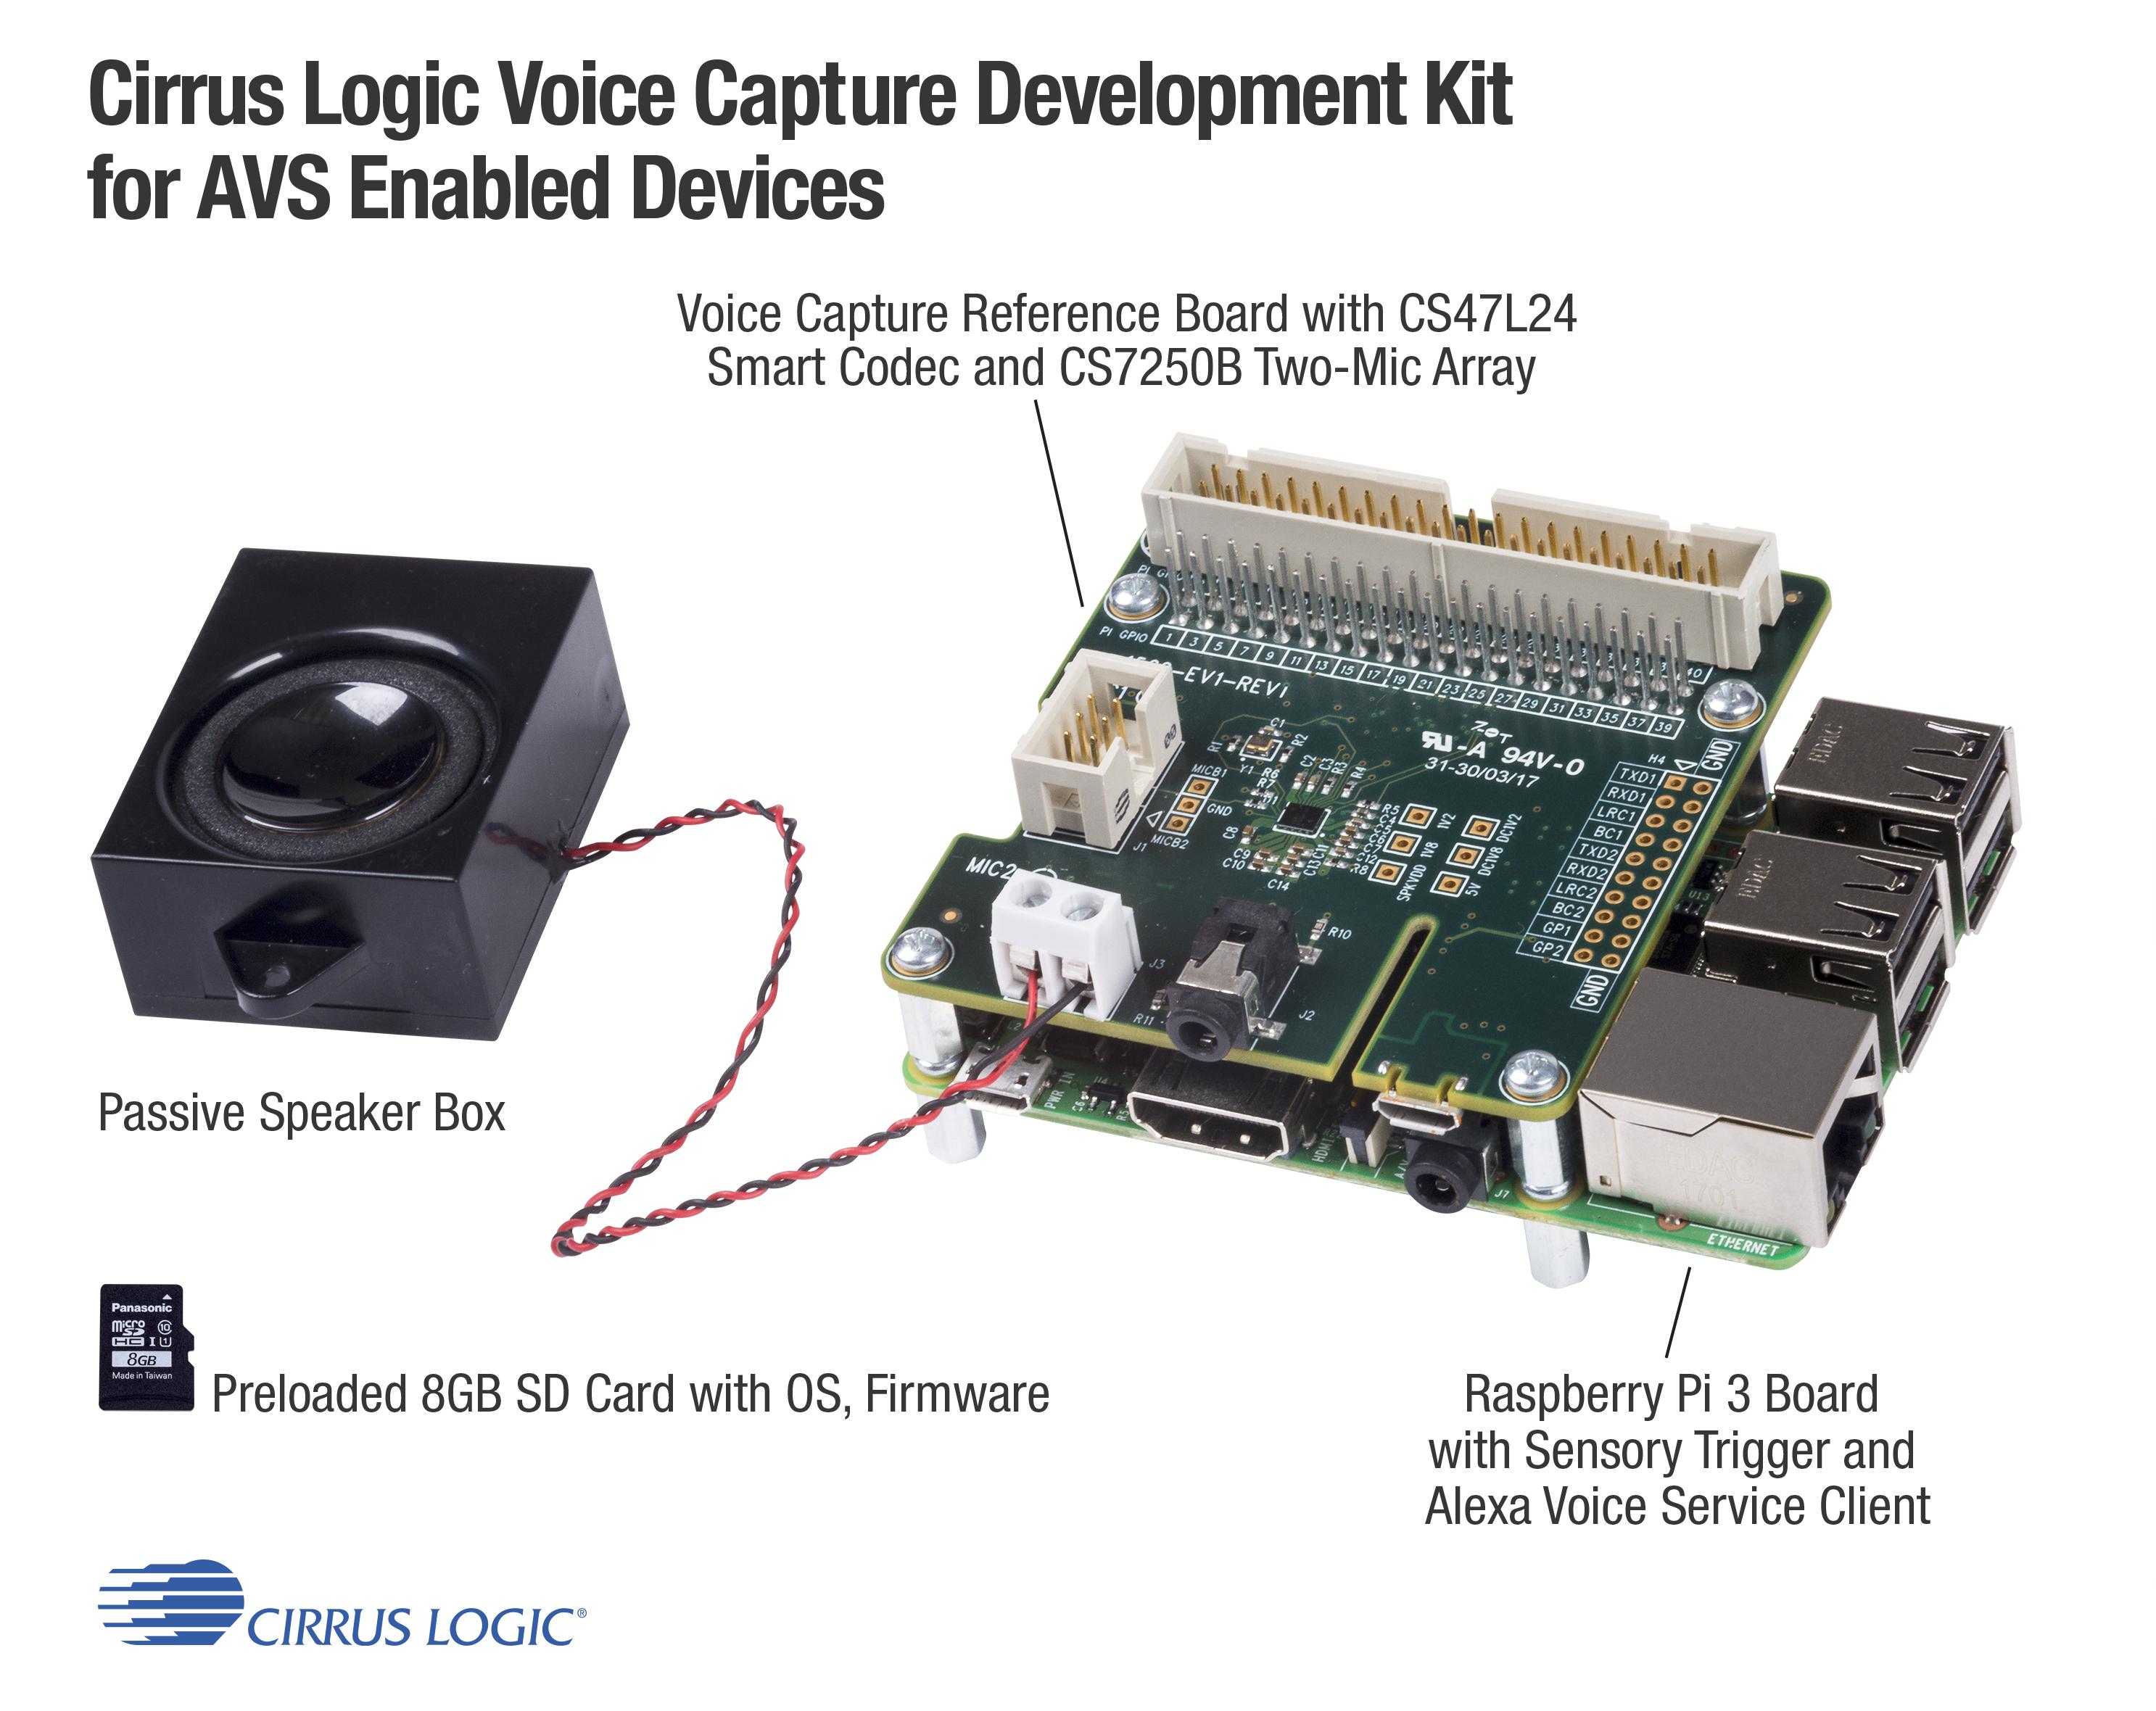 The Cirrus Logic Voice Capture Development Kit for Amazon Alexa Voice Service. (Graphic: Business Wire)